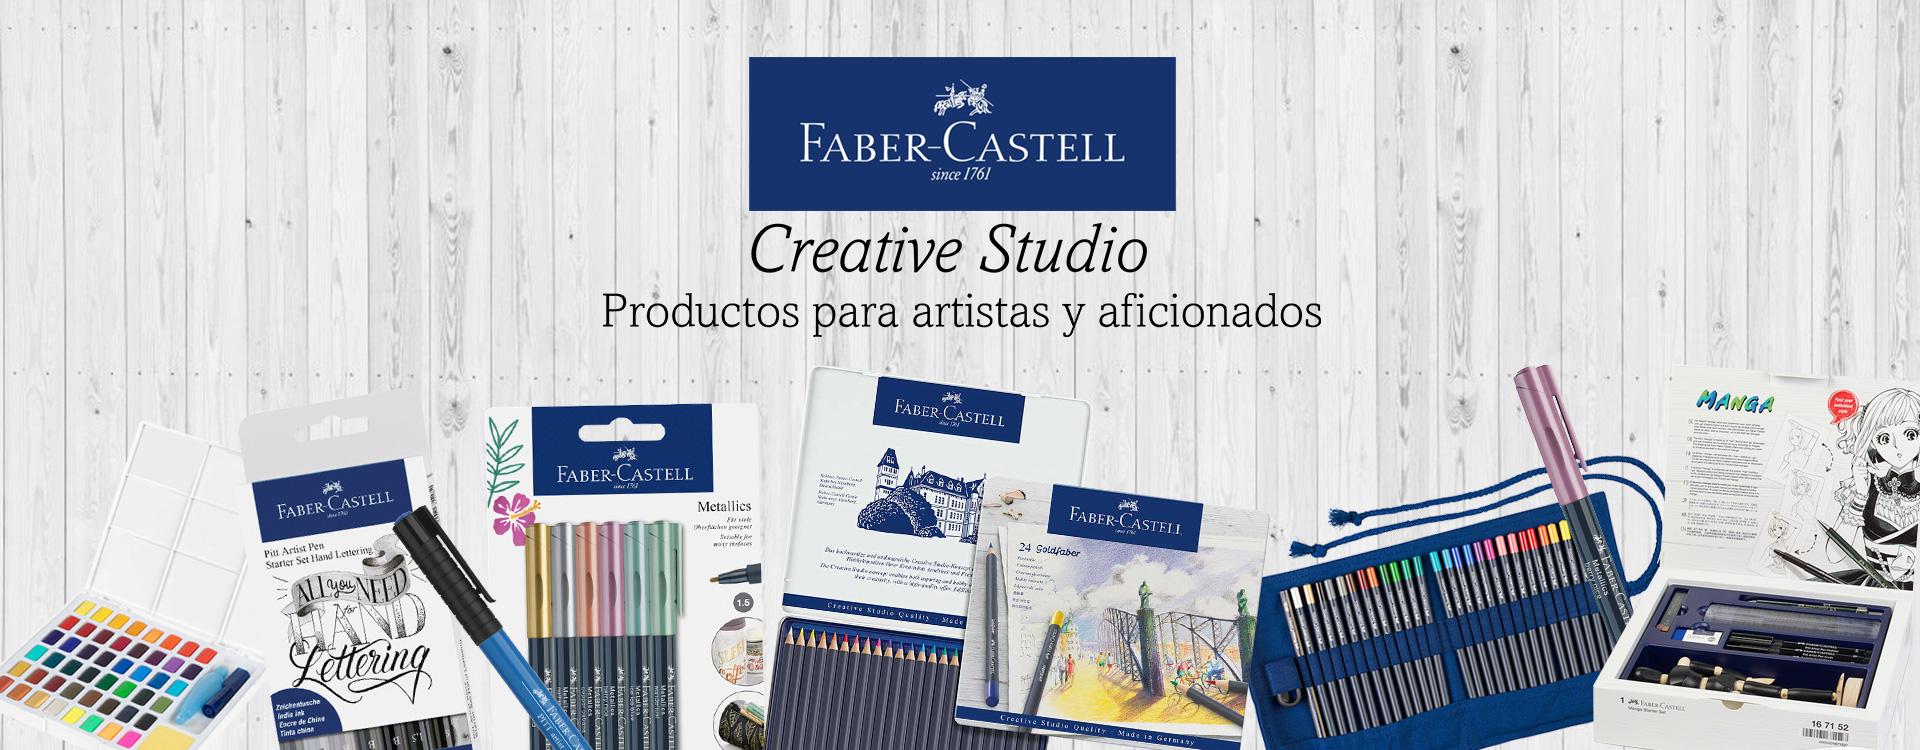 banner-creative-studio